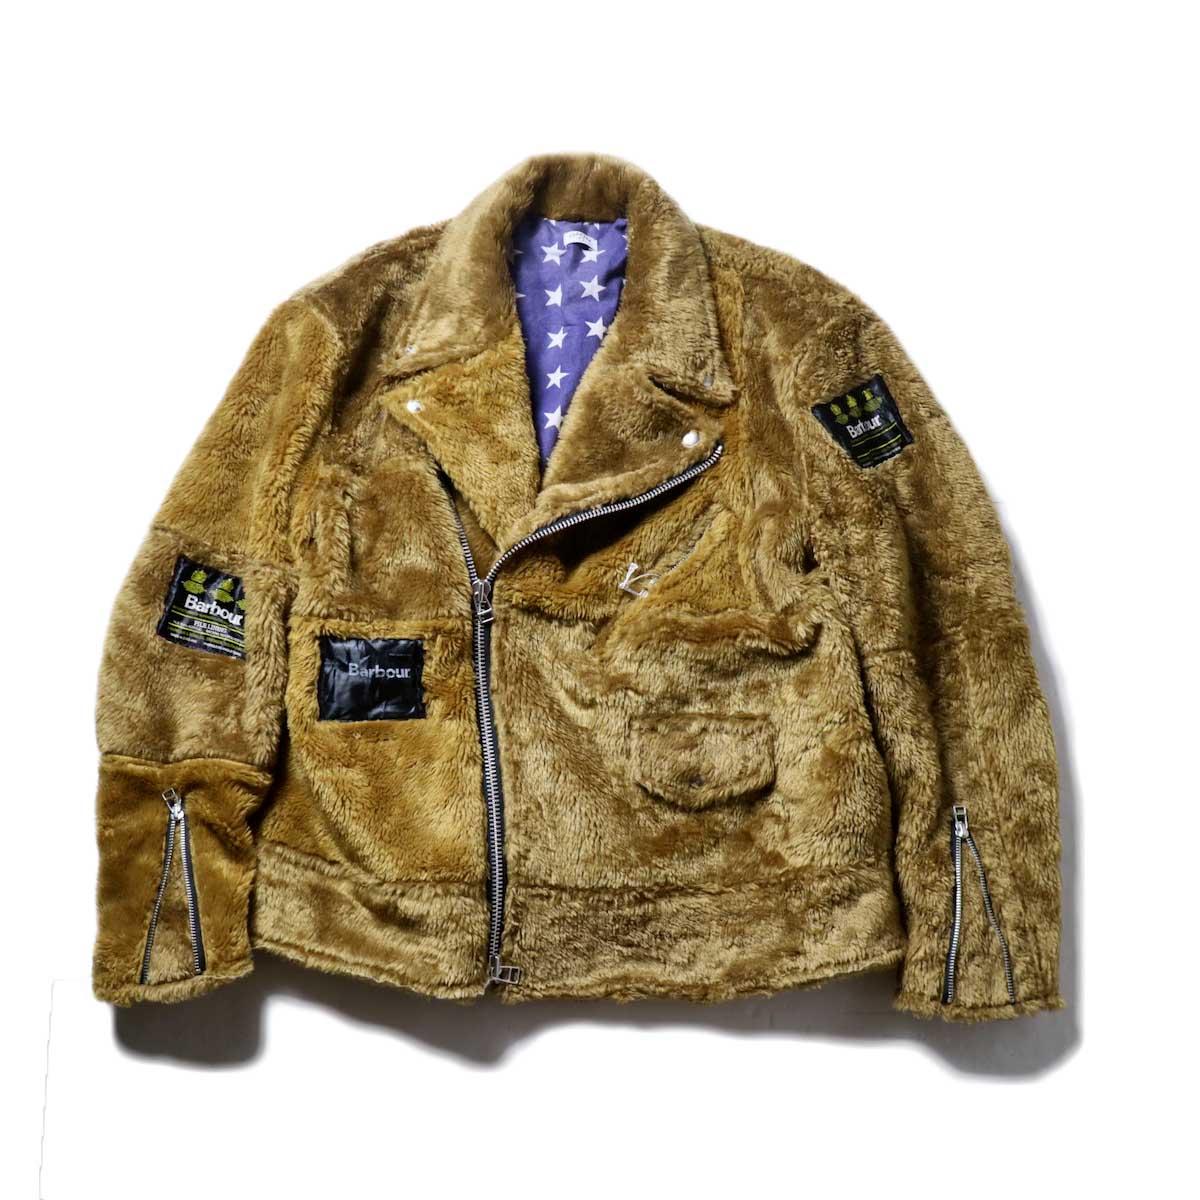 OLD PARK / Oversized Riders Jacket -Liner (Brown)